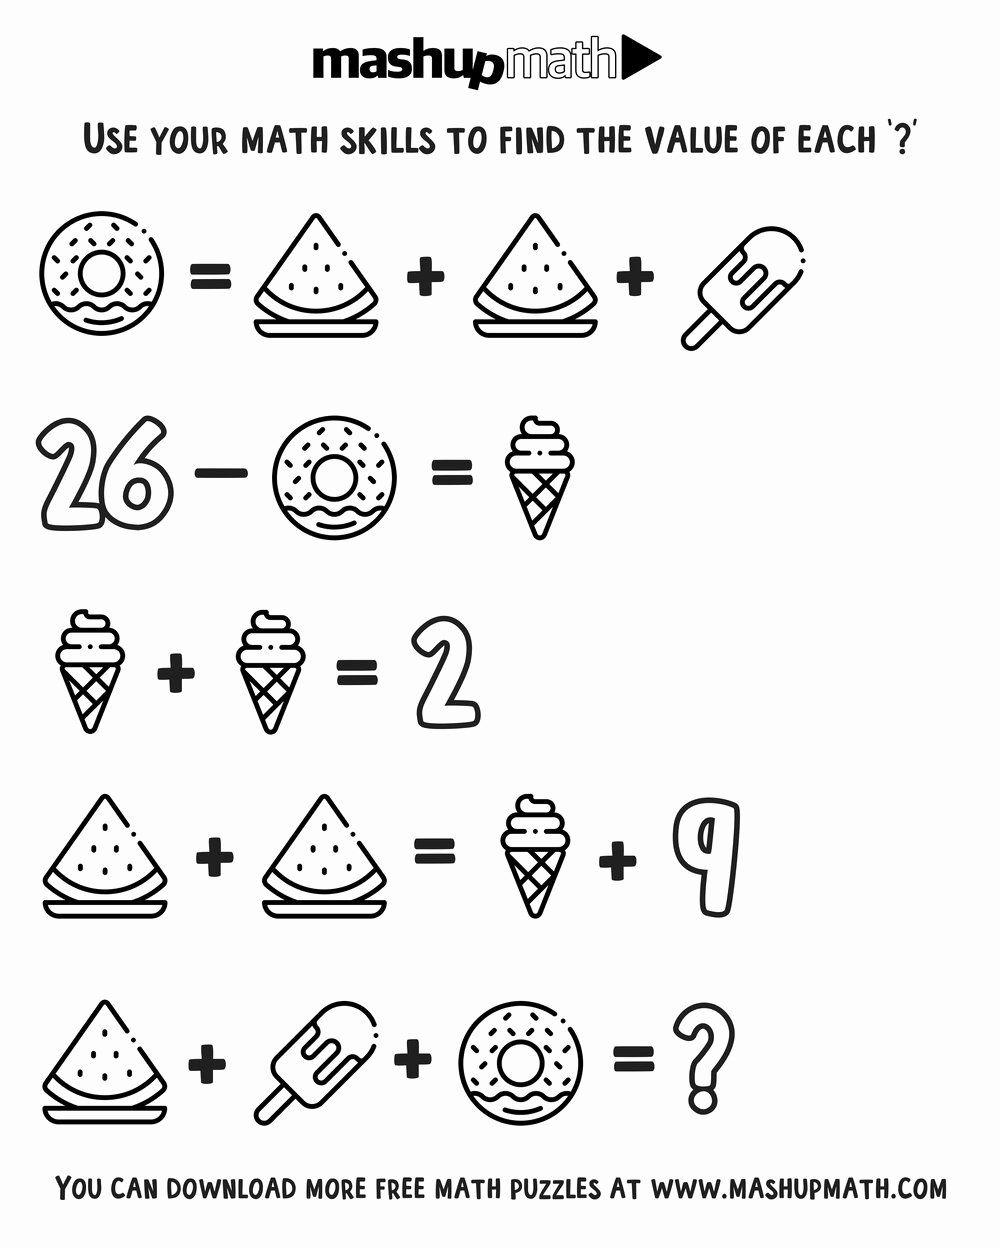 Christmas Coloring Activity Sheets Fresh Coloring Pages Christmas Coloring Worksheets For Kids Fre In 2020 Math Coloring Worksheets 4th Grade Math Worksheets Free Math [ 1248 x 1000 Pixel ]